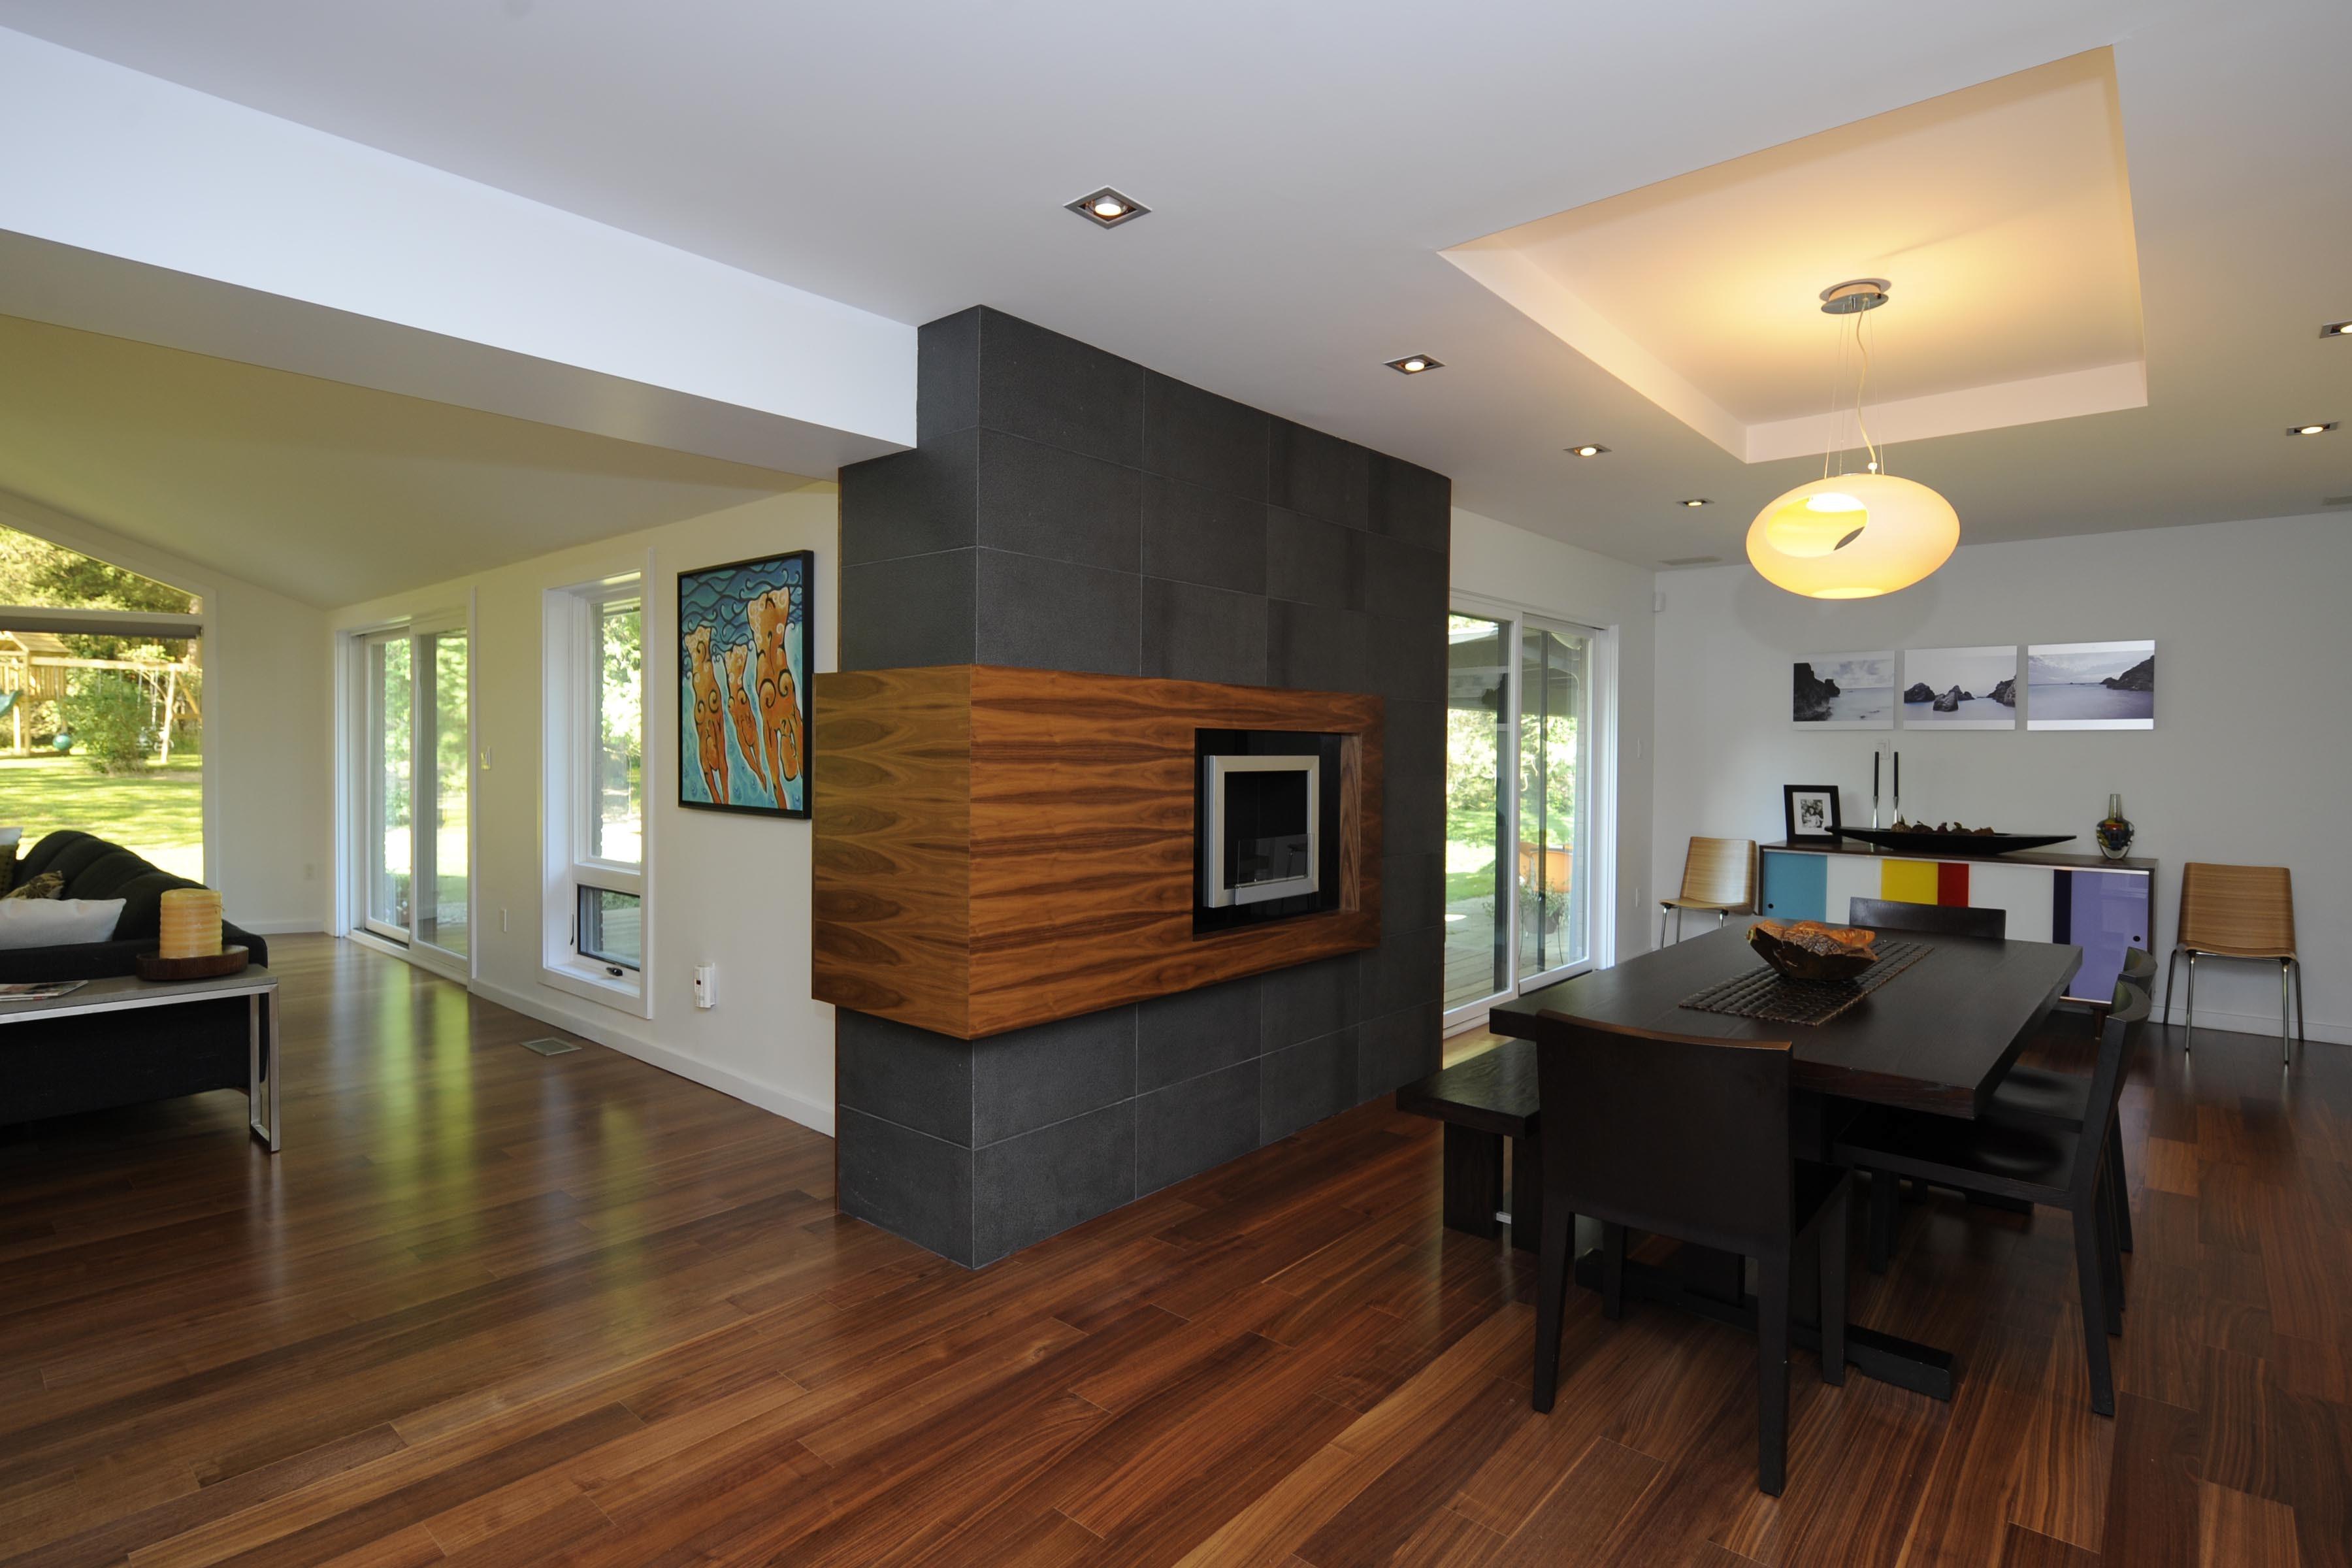 private residence interior renovations london ontario